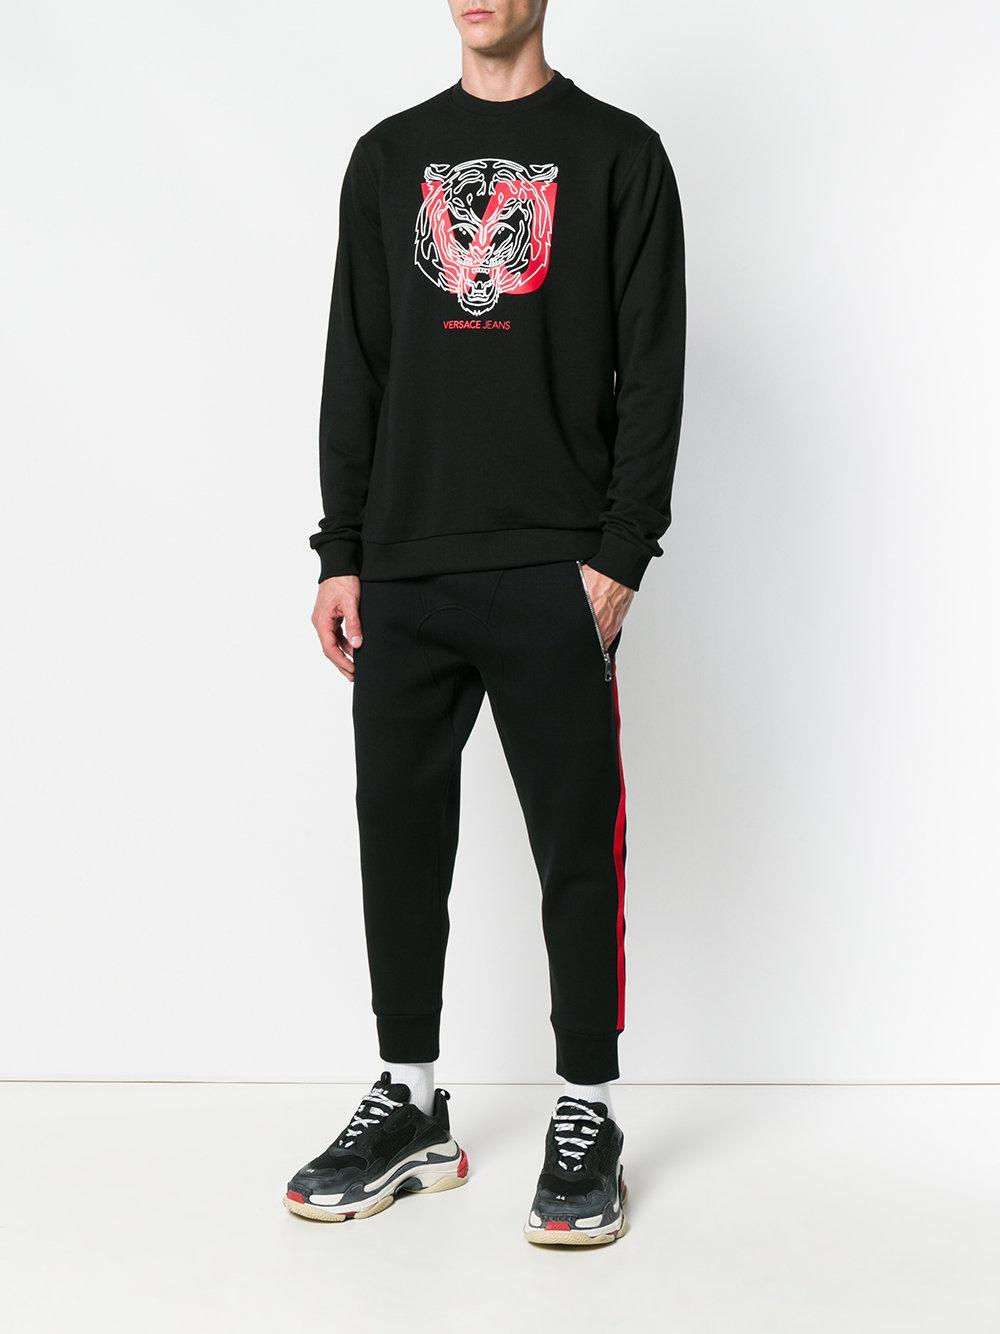 Versace Jeans Couture Cotton Graphic Logo Print Sweatshirt in Black for Men